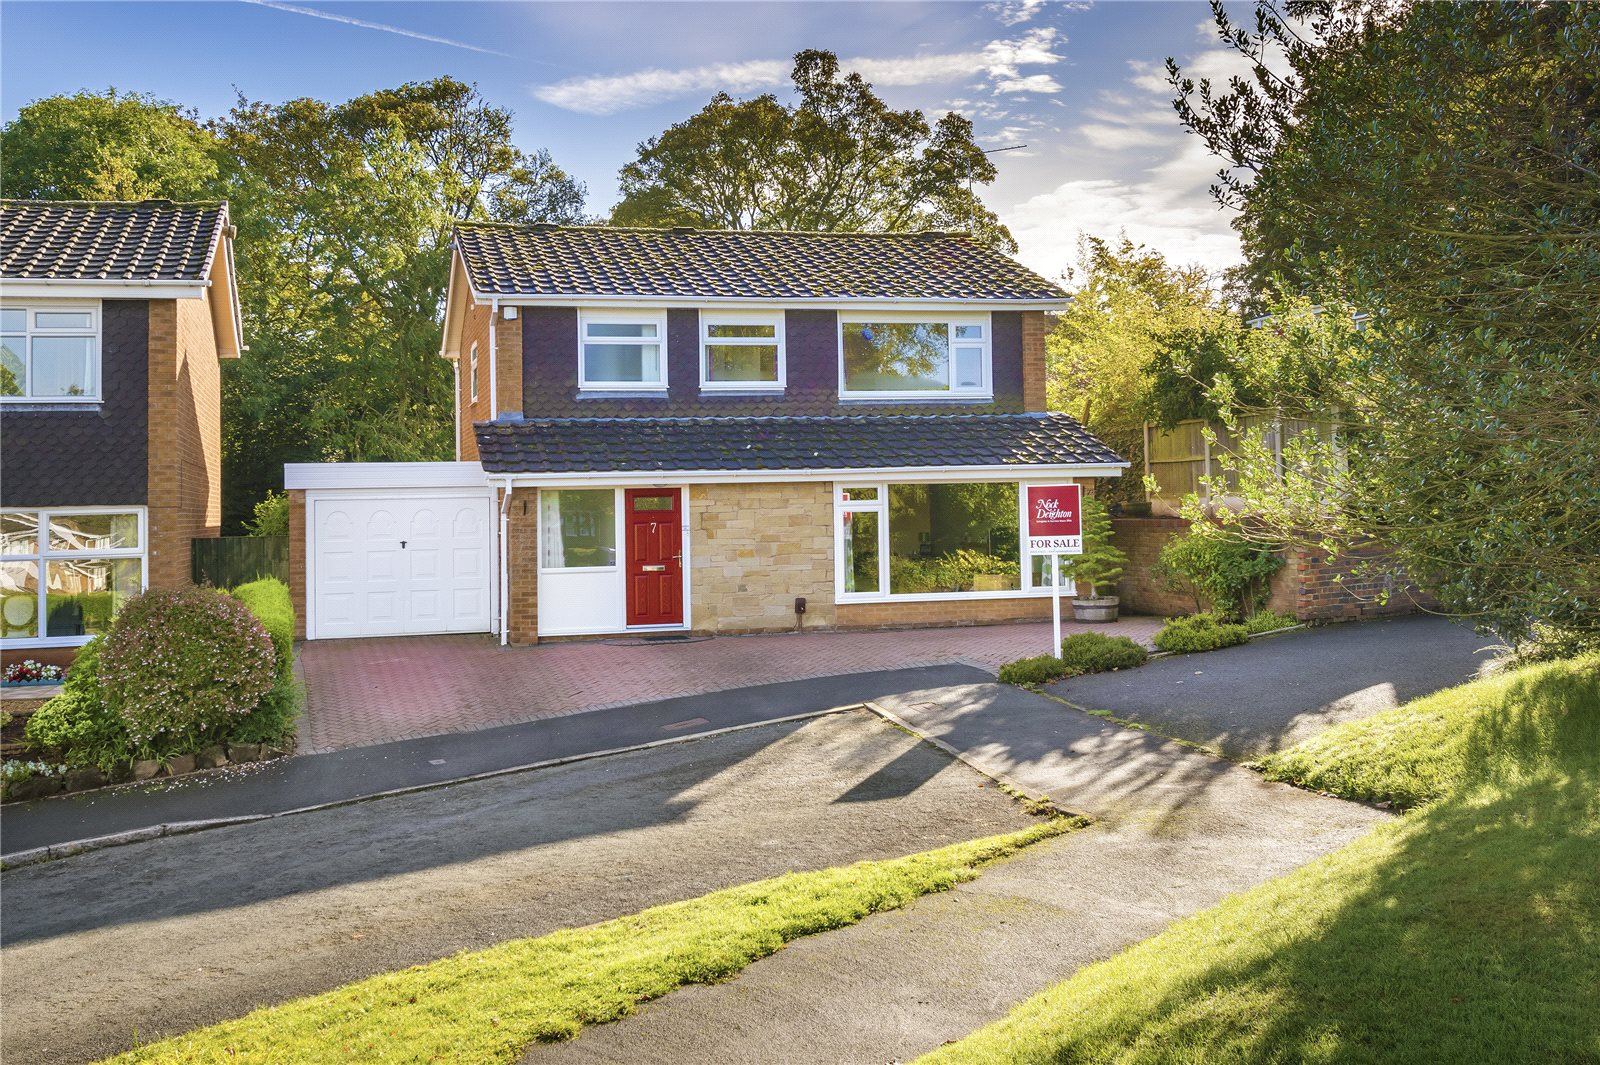 7 Highfield, Church Aston, Newport, Shropshire, TF10